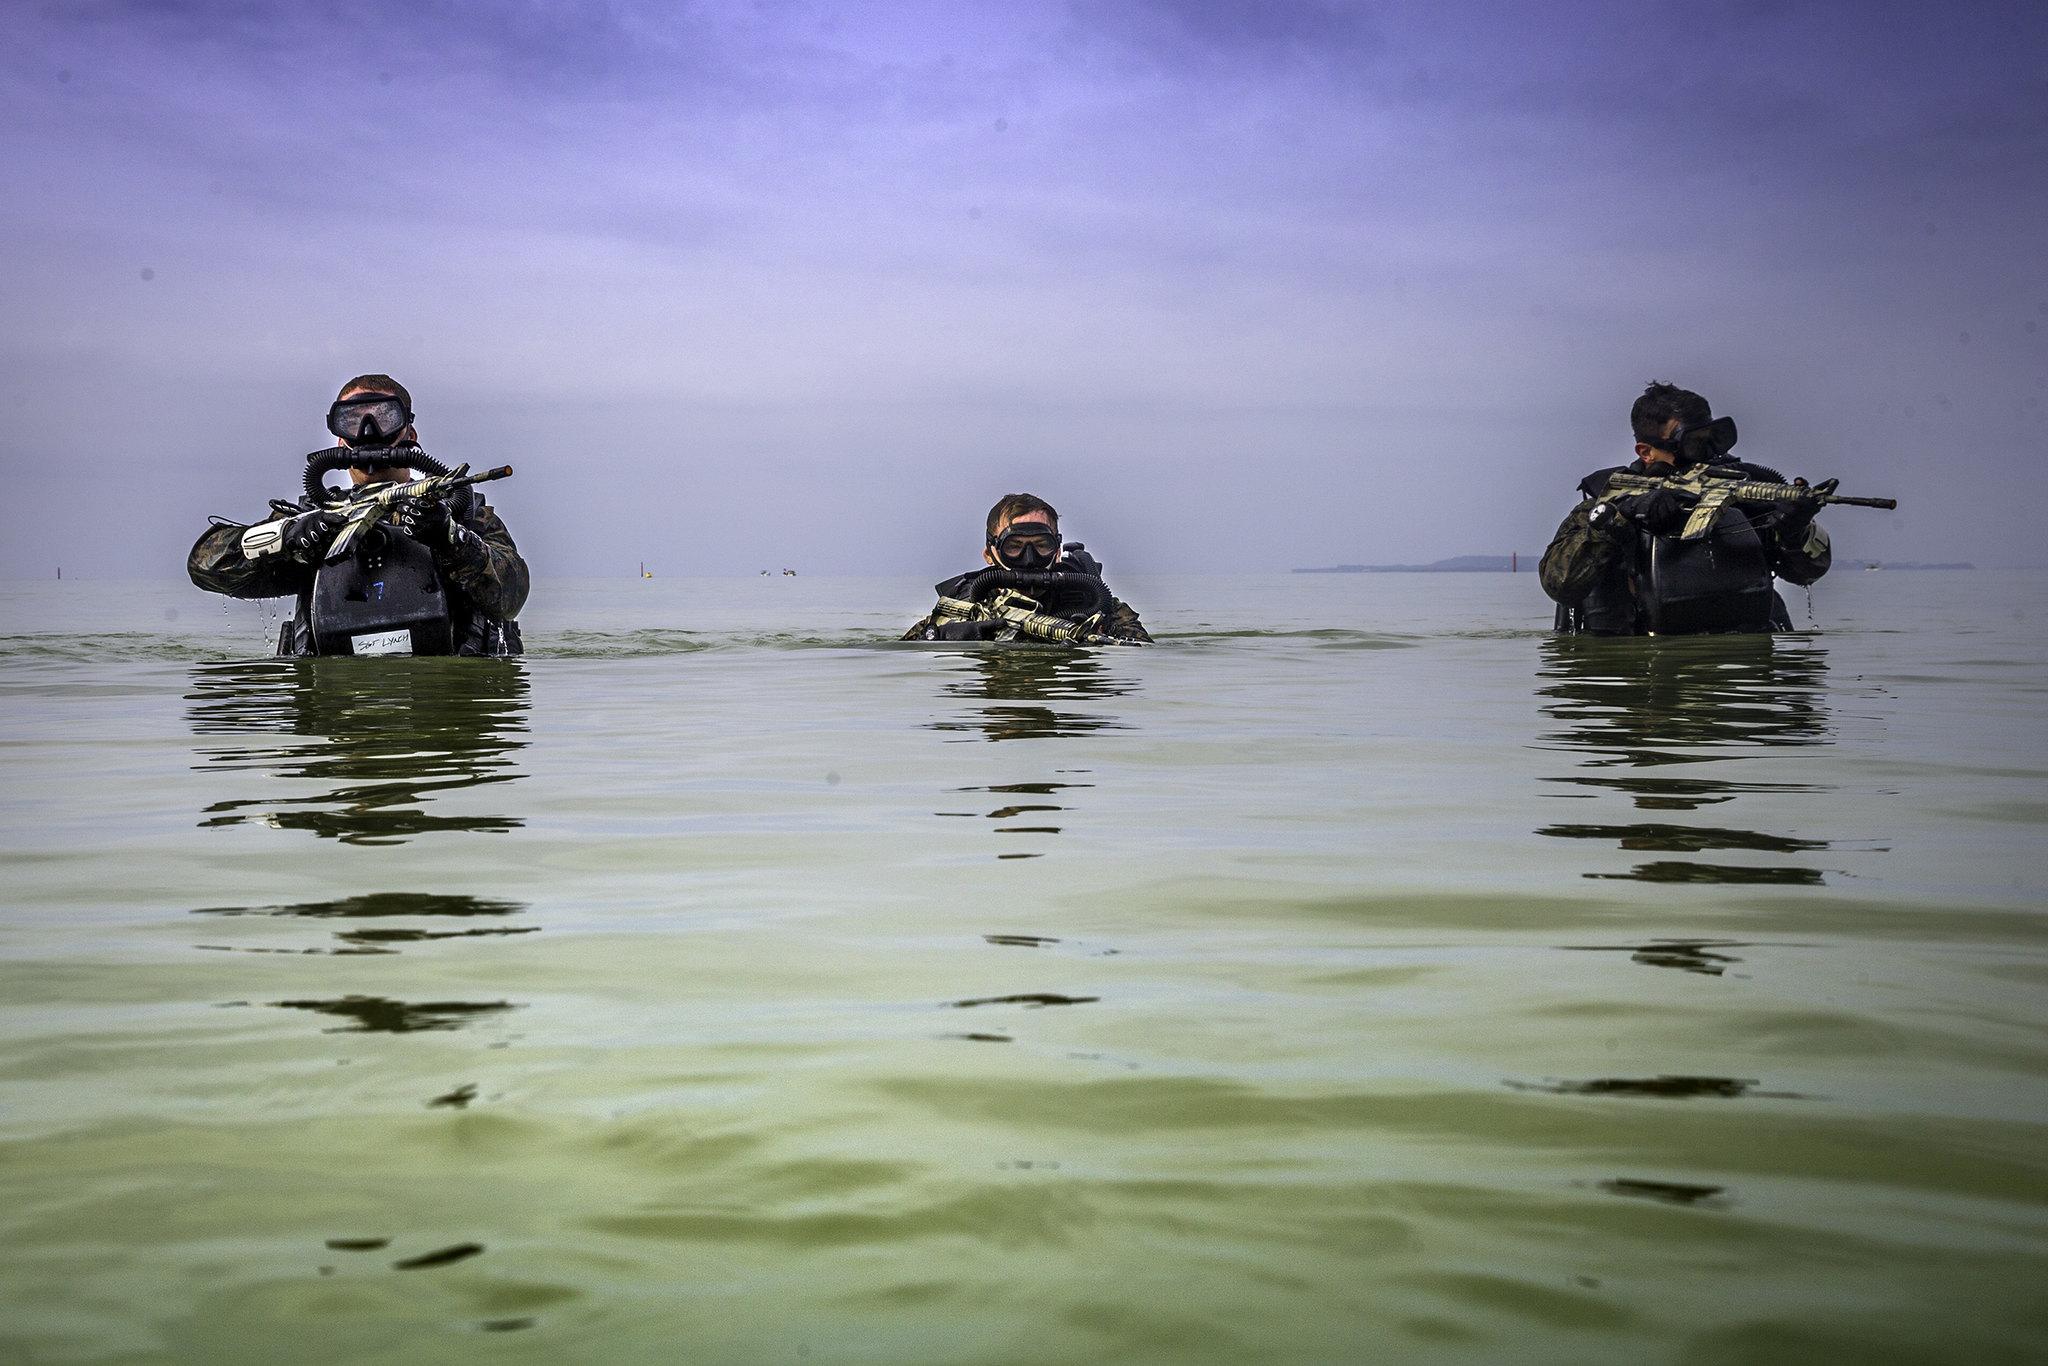 U.S. Marines patrol through water during a Marine Corps Combat Diving Supervisors Course on Camp Schwab, Okinawa, Japan, May 20, 2020. (Cpl. Savannah Mesimer/Marine Corps)